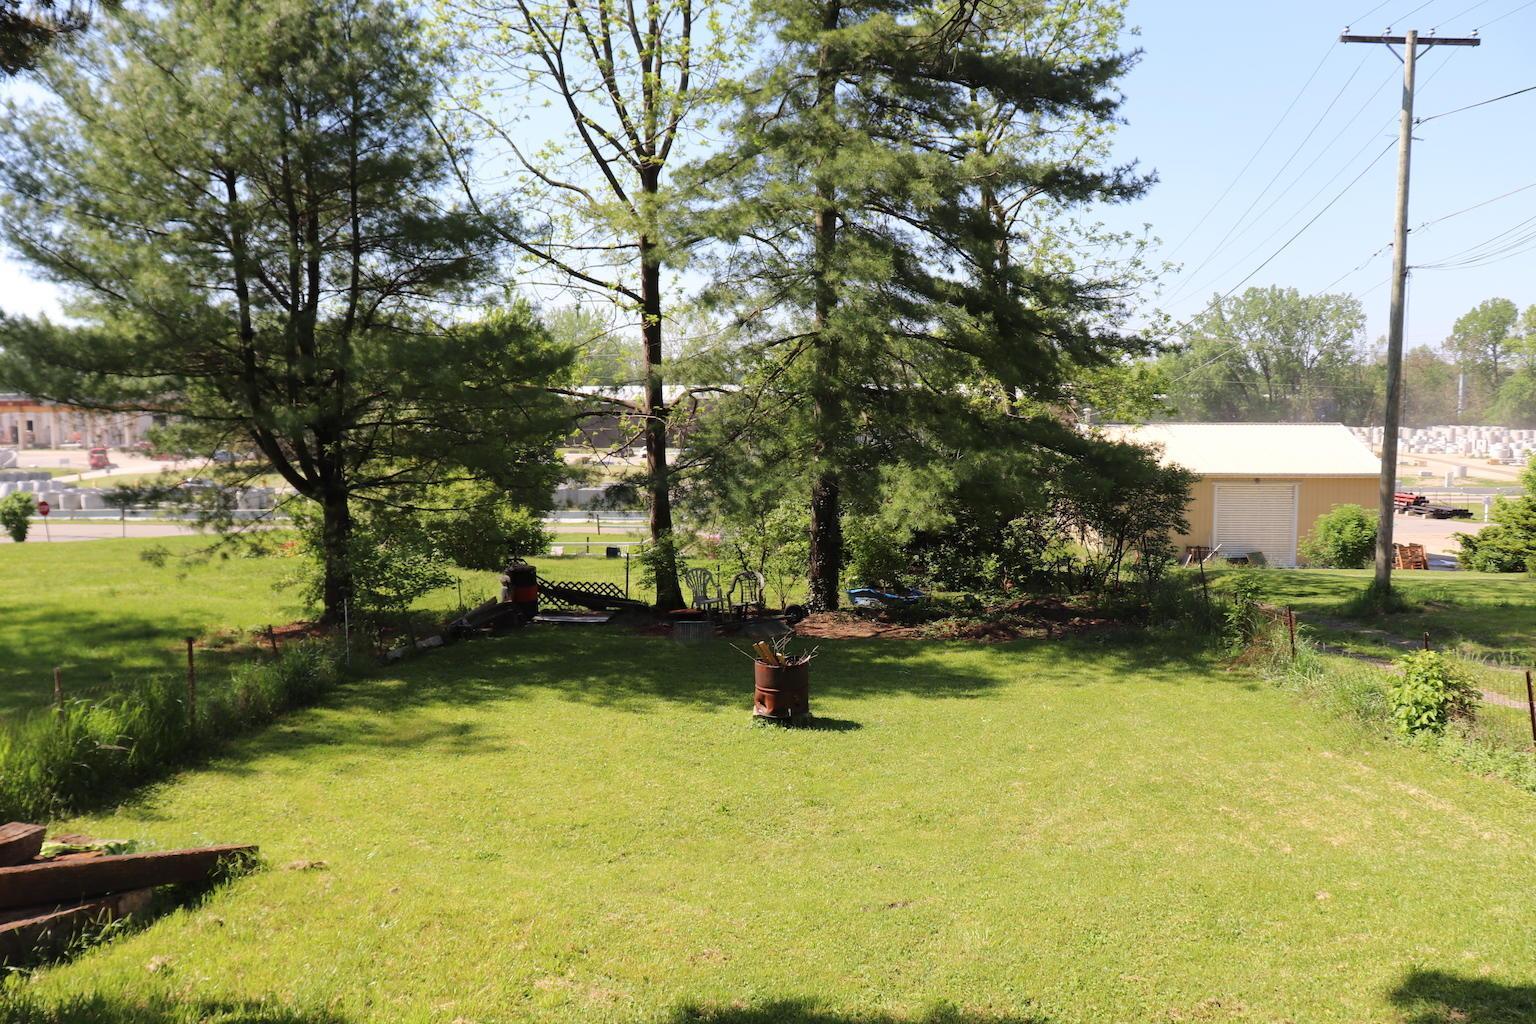 506 Ohio Avenue, Mount Vernon, Ohio 43050, 3 Bedrooms Bedrooms, ,2 BathroomsBathrooms,Residential,For Sale,Ohio,220016808